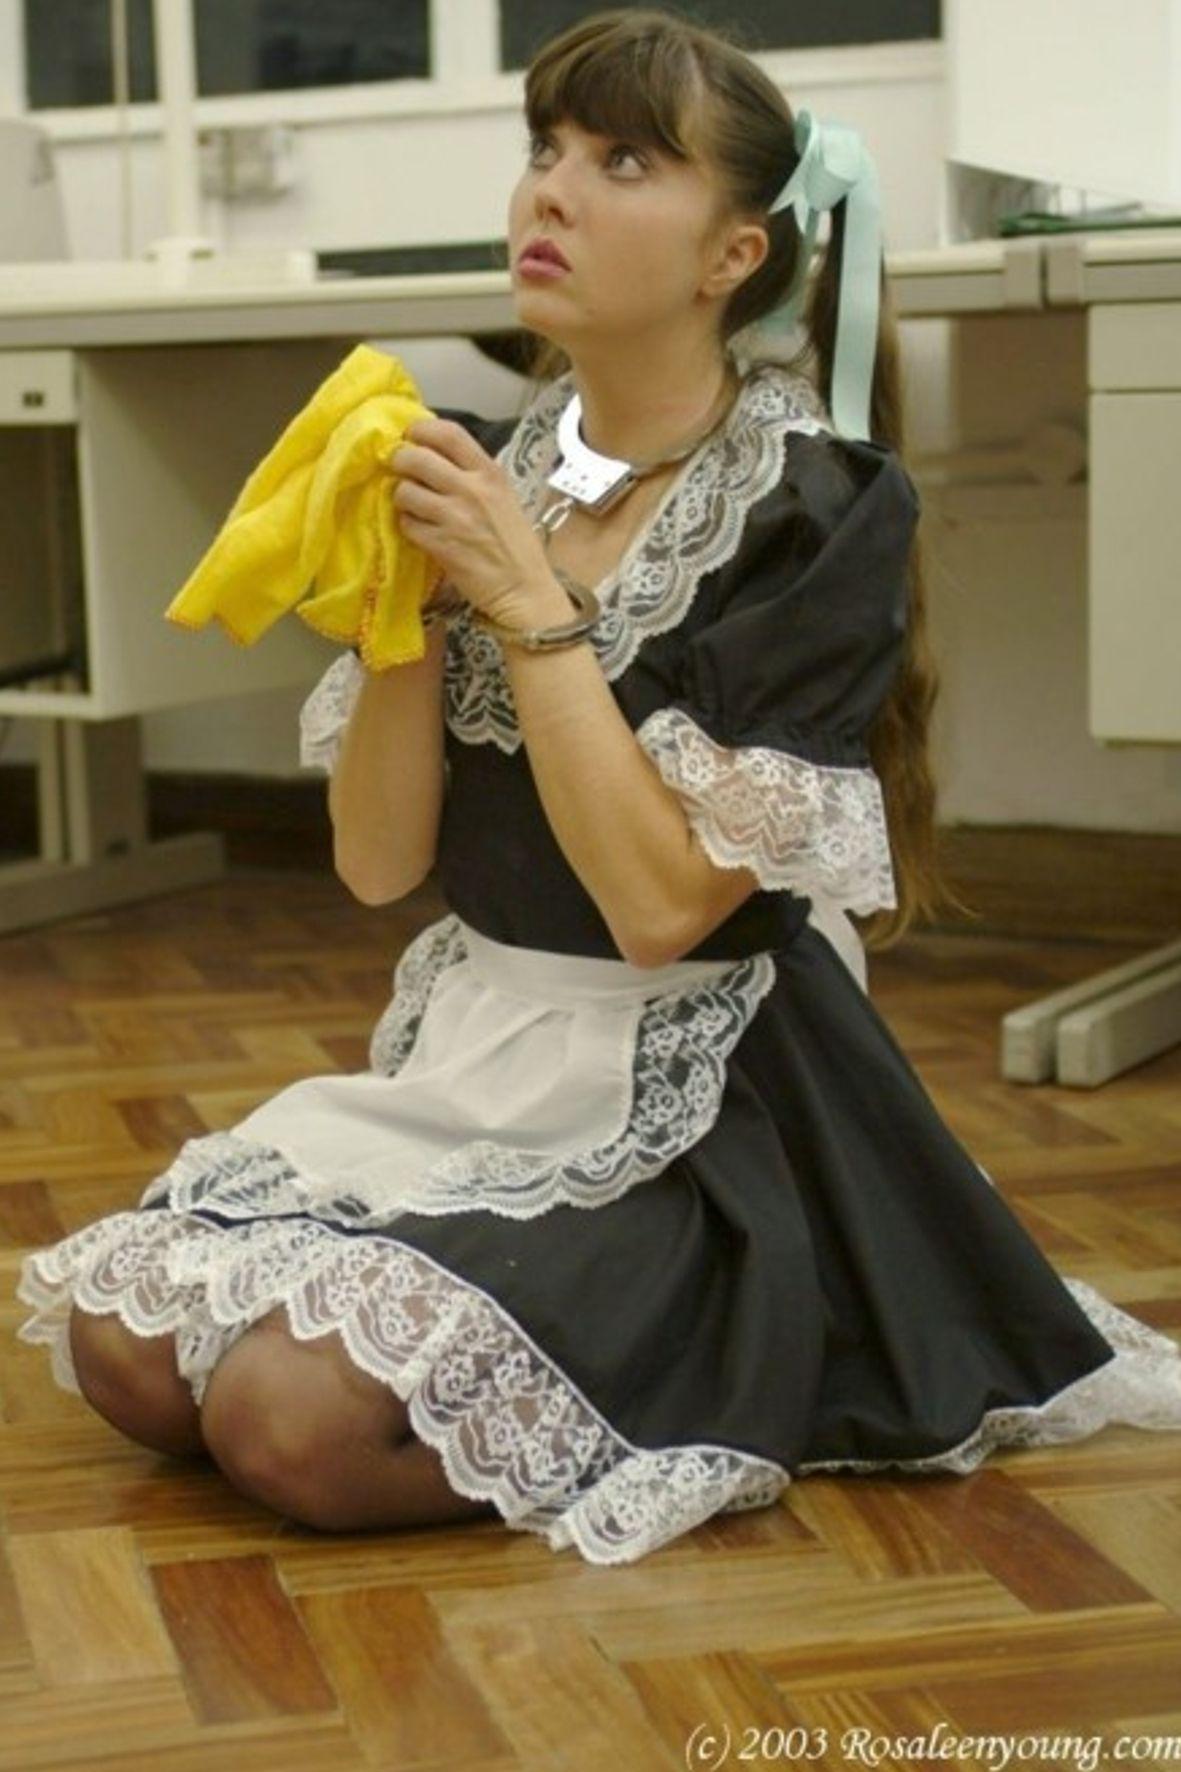 cherche femme de ménage geneve)